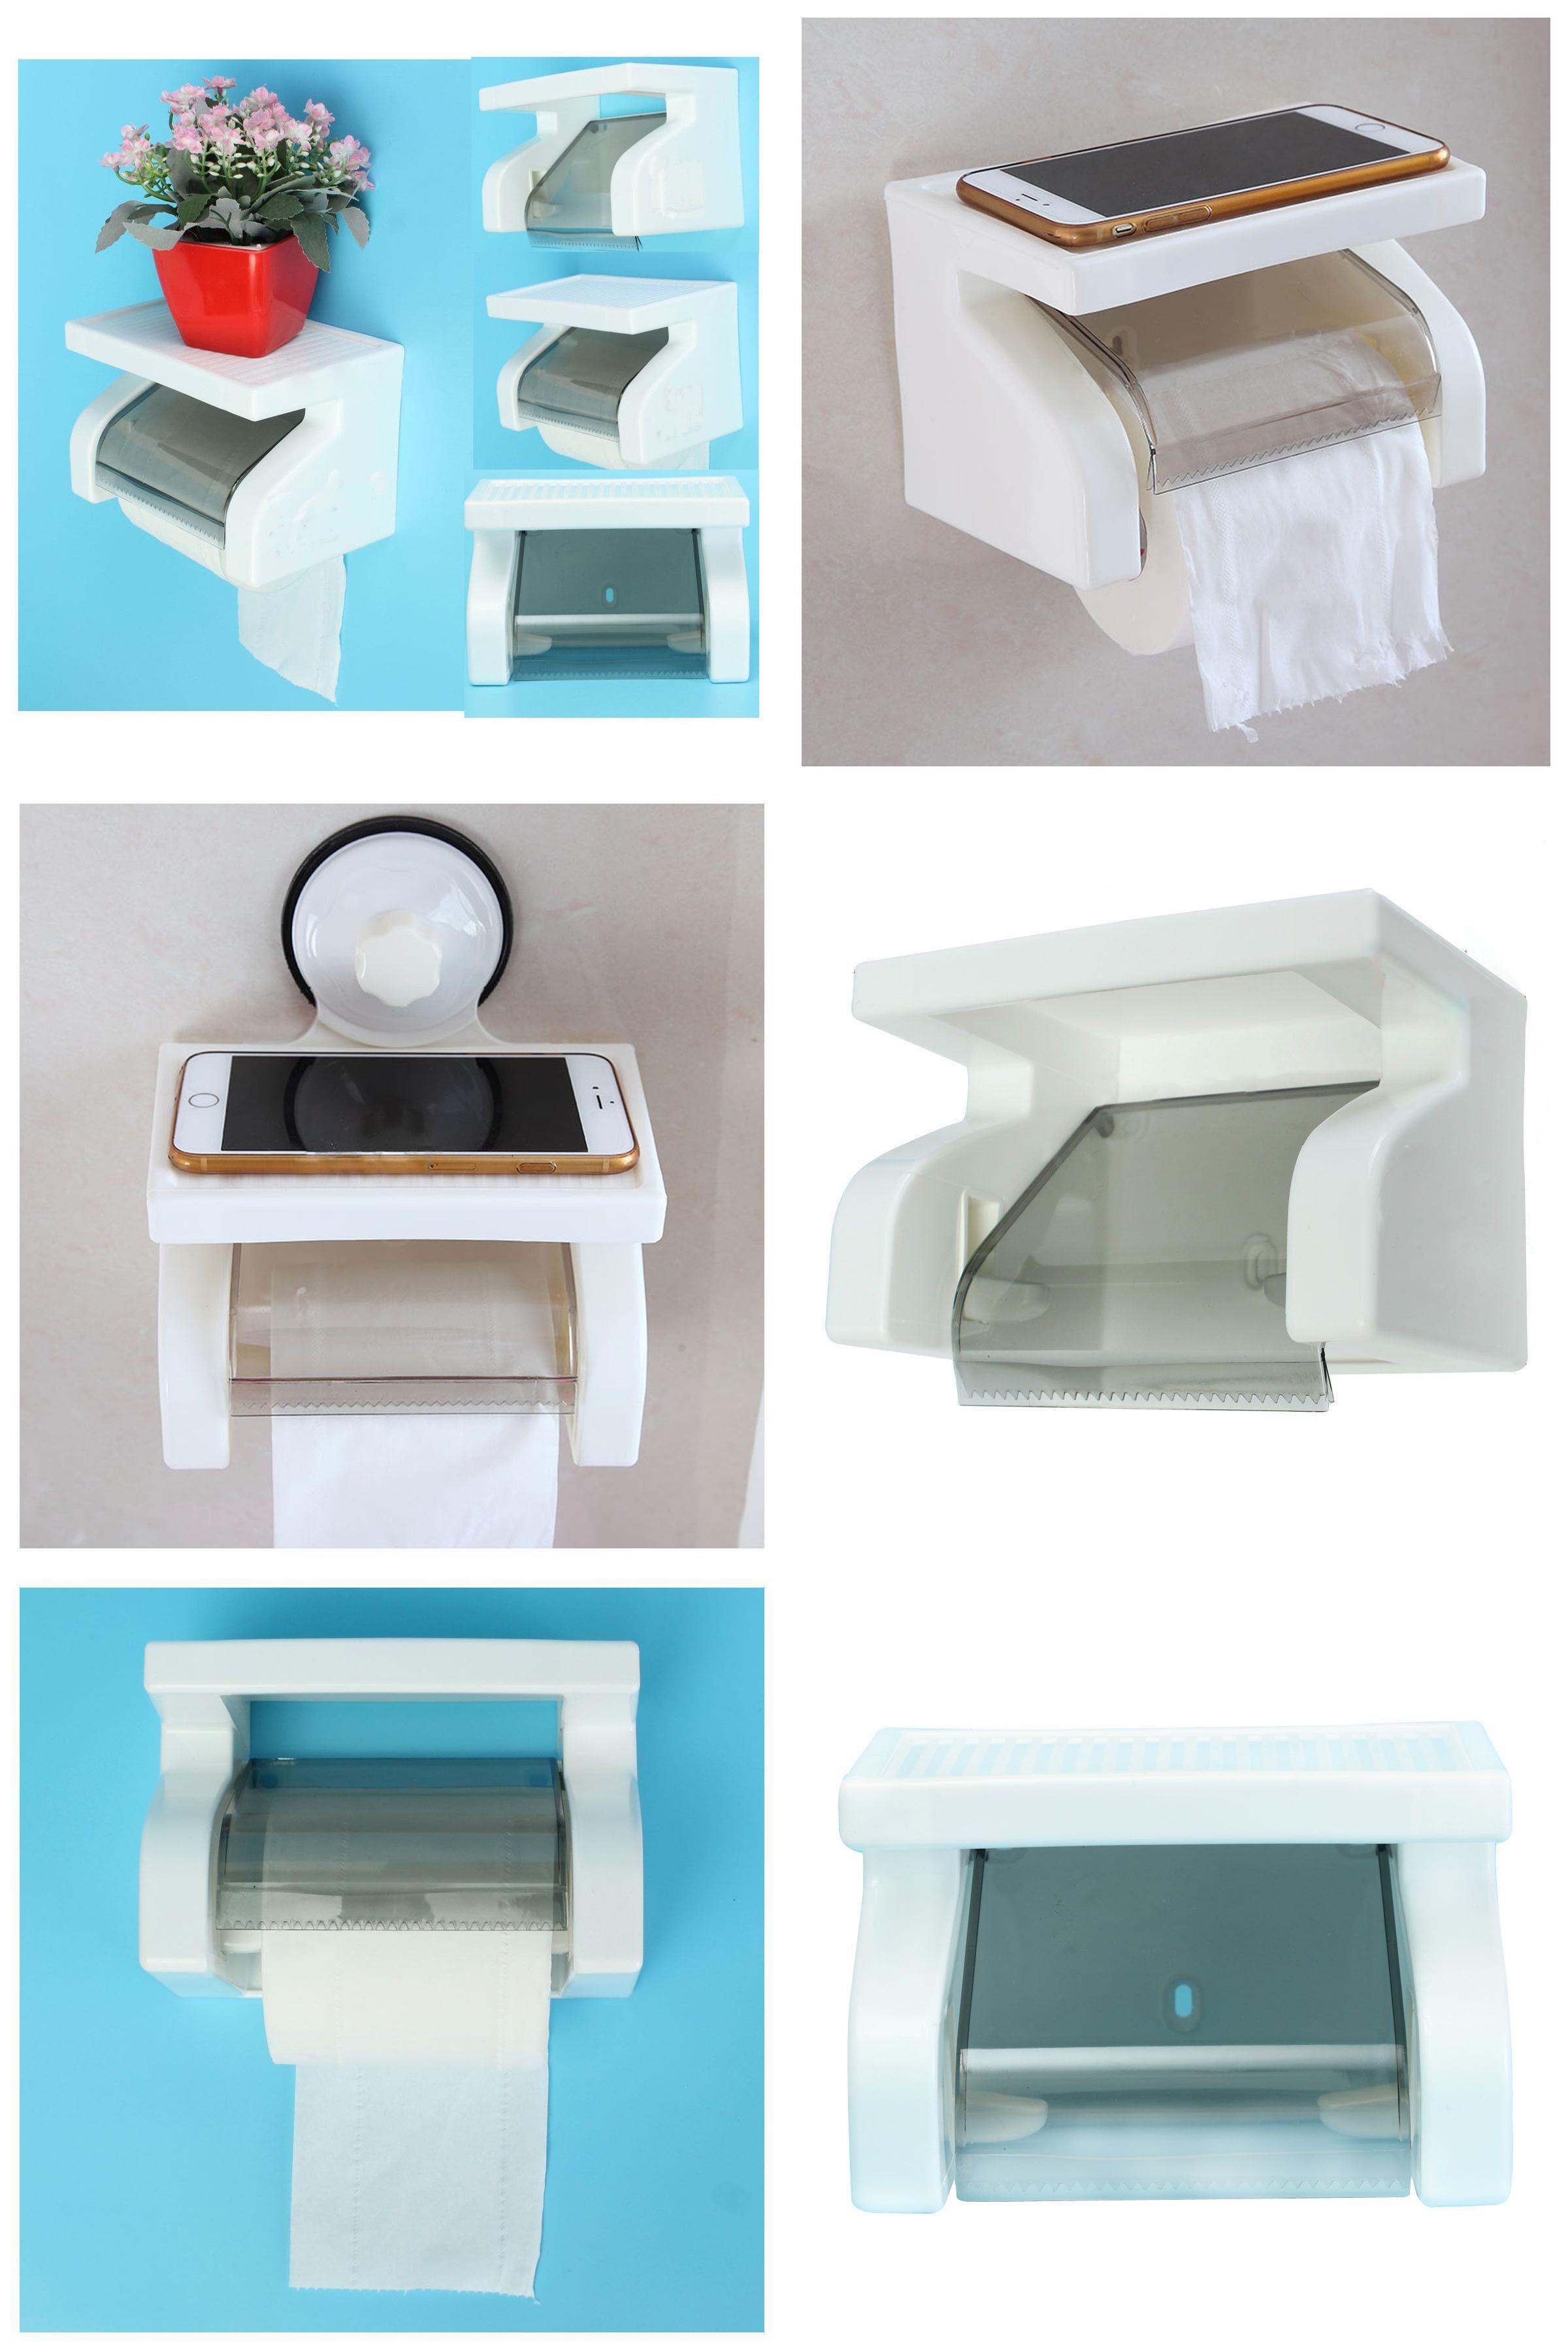 visit to buy promotion waterproof toilet paper holder tissue